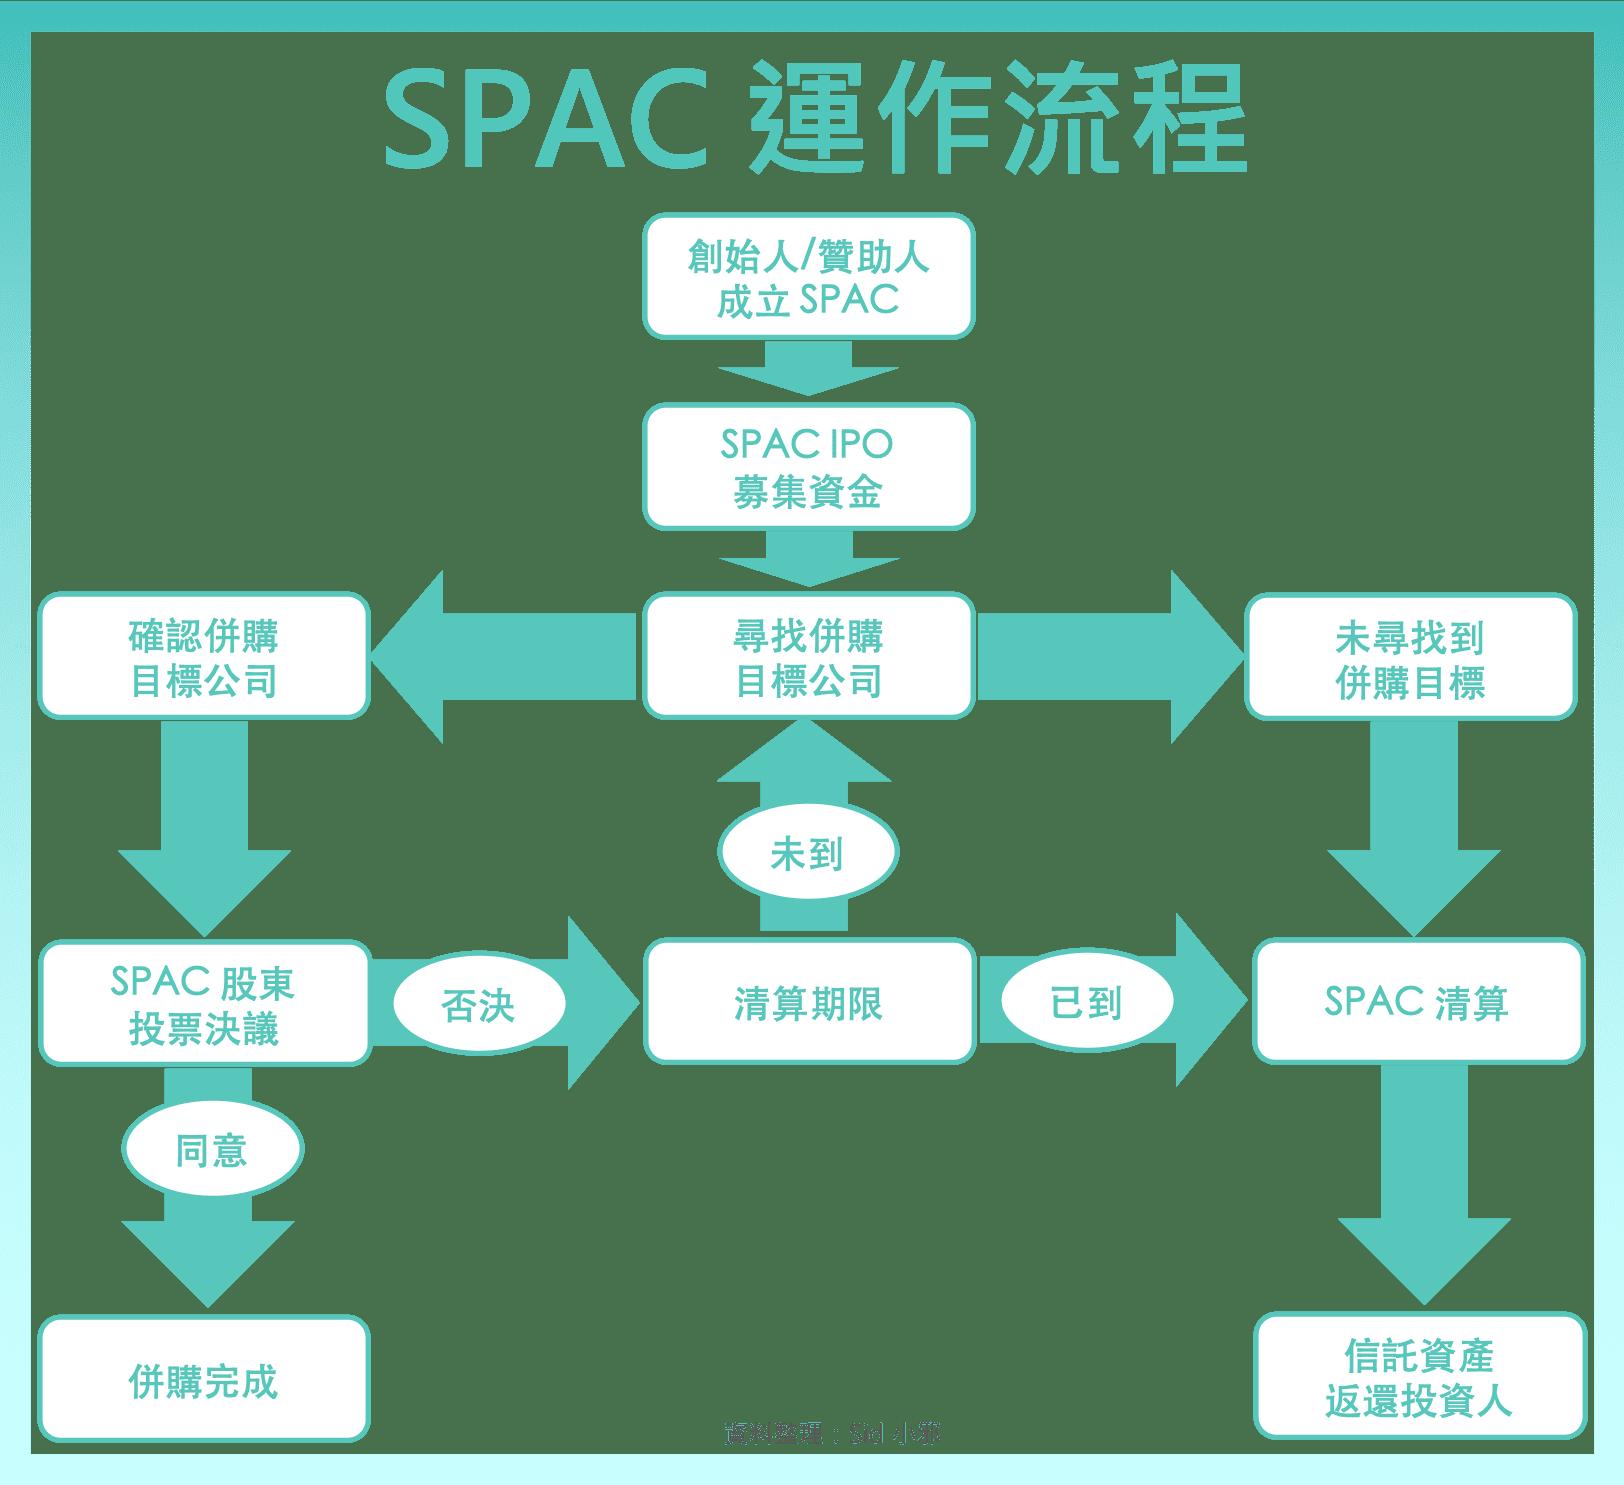 SPAC IPO 上市 軟銀 願景基金